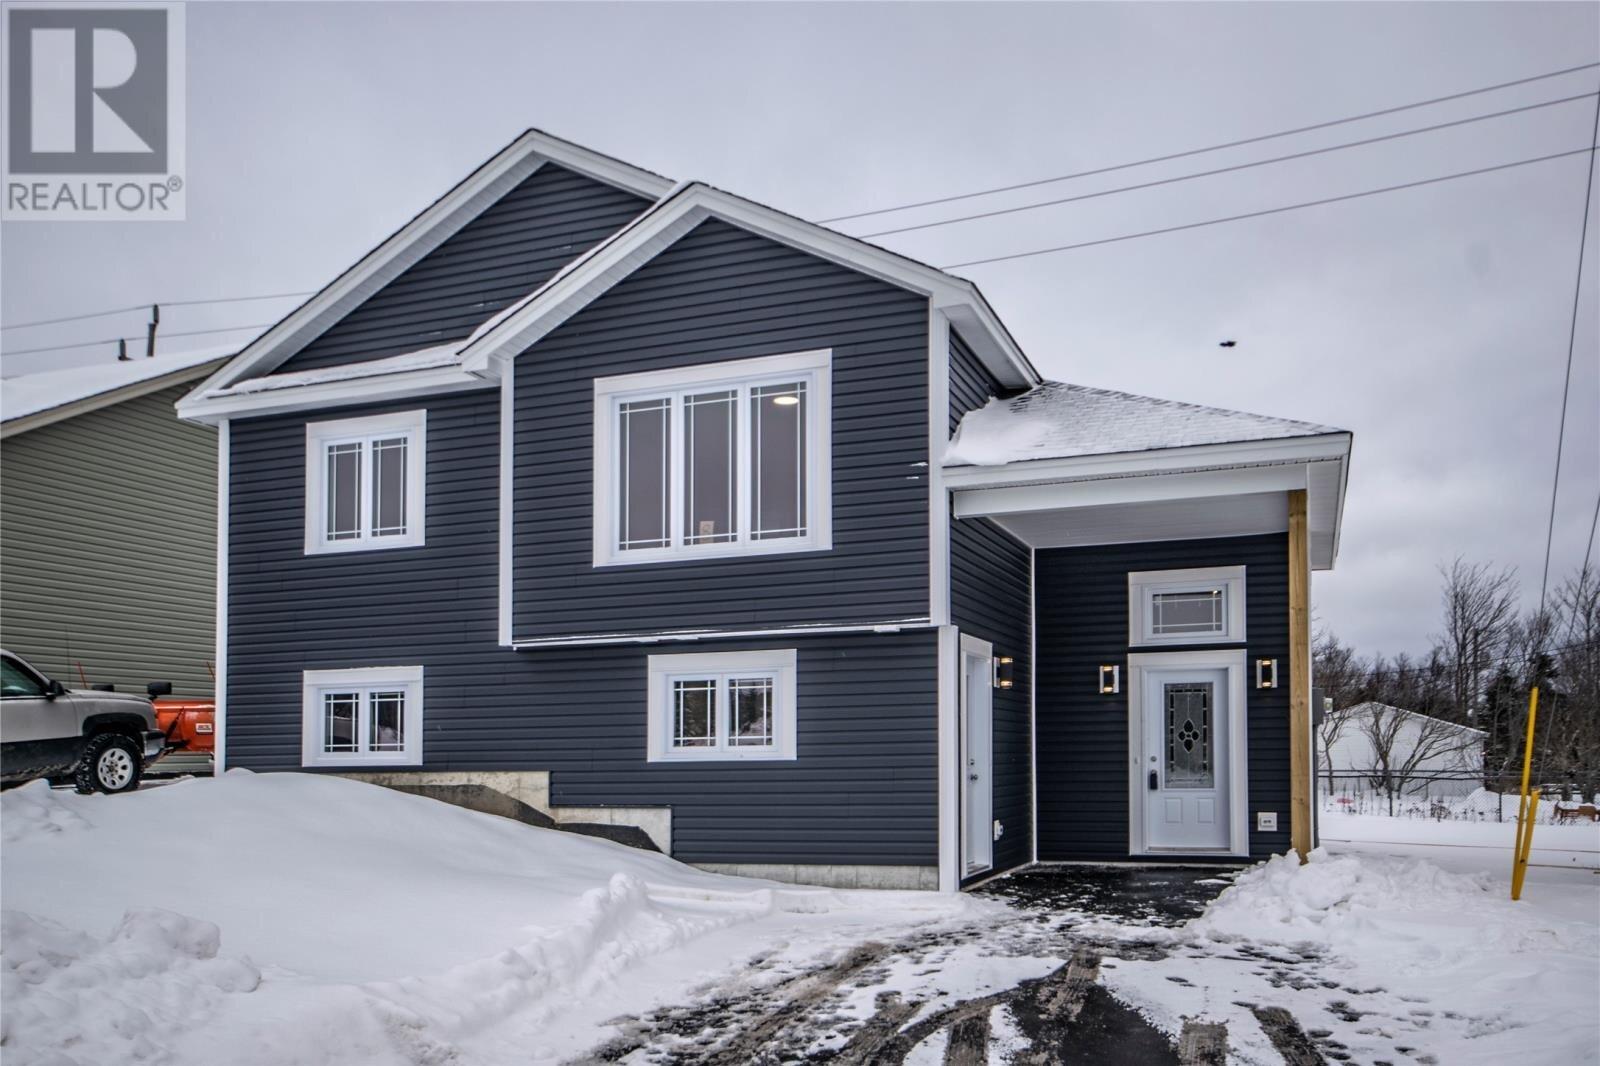 House for sale at 8 Padre Nangle Pl St. John's Newfoundland - MLS: 1214186